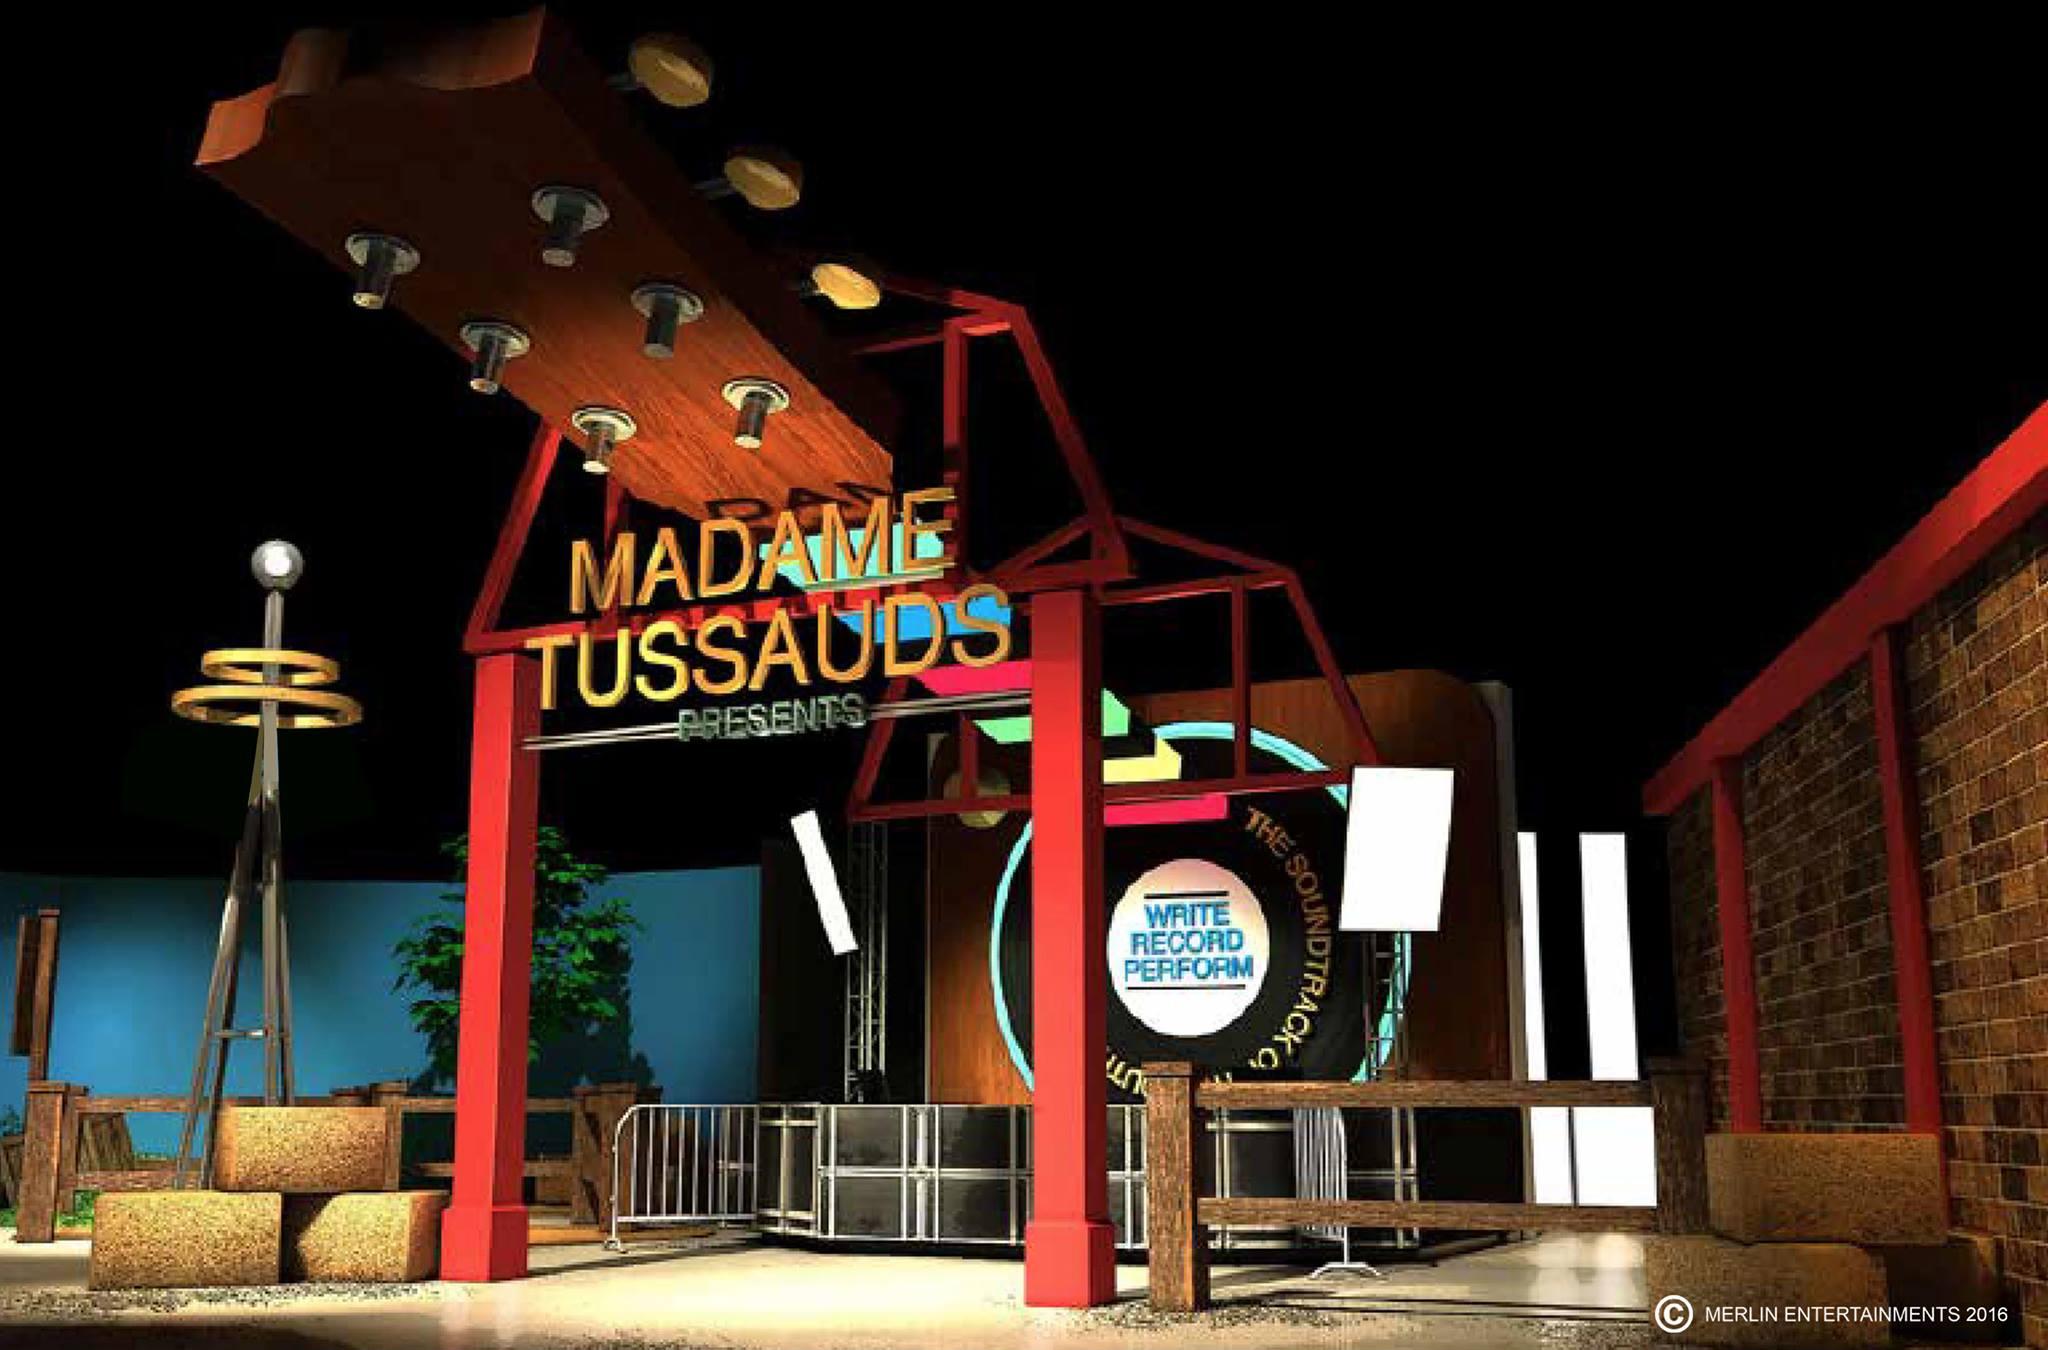 Madame Tussauds Wax Museum Opening In Nashville In 2017 ...